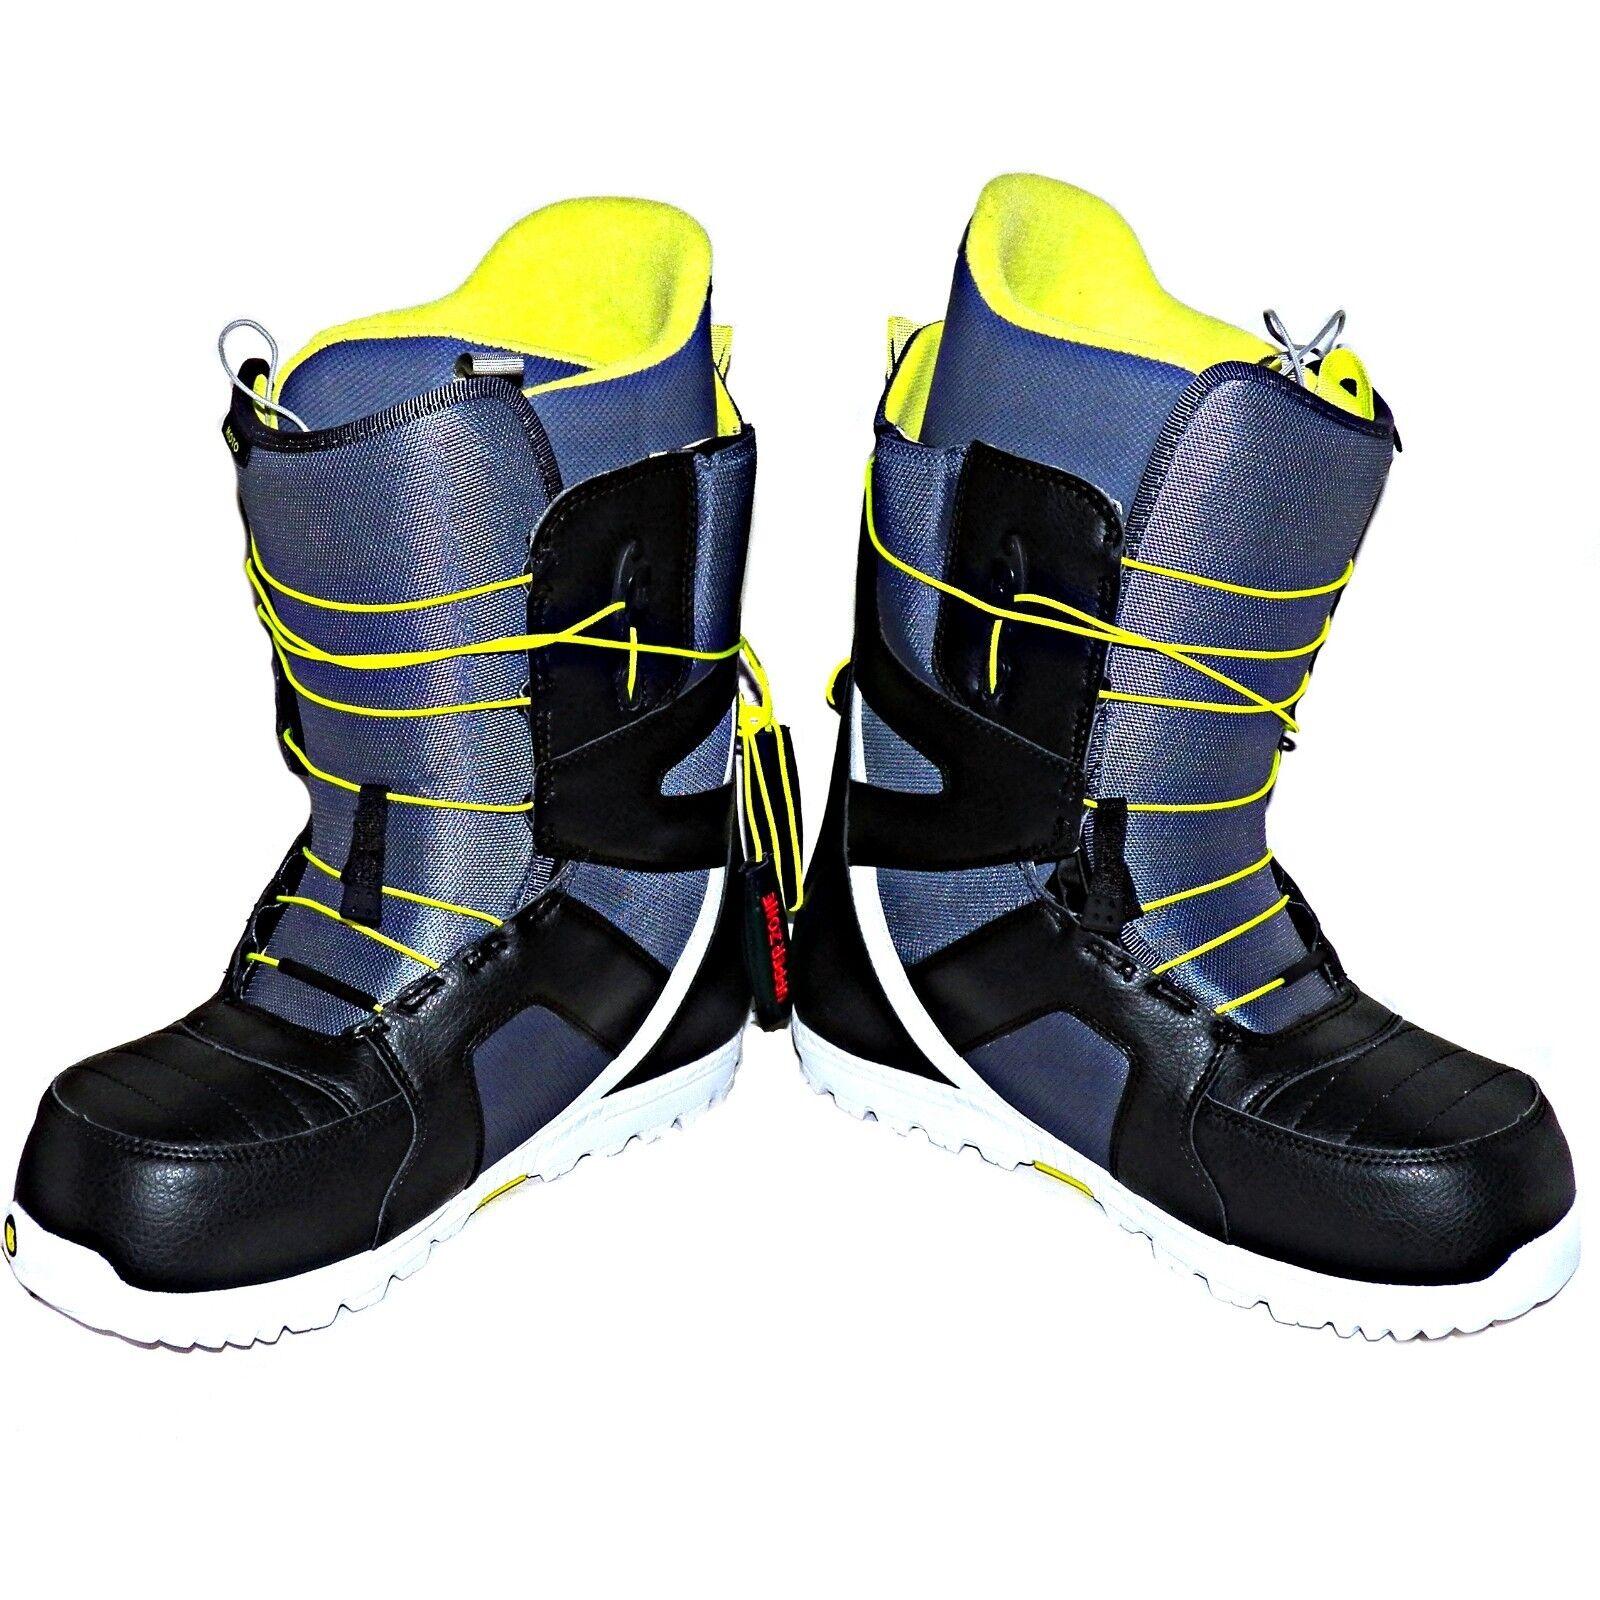 Burton Moto Snowboard Snow Sports Boots Speed Zone Lacing System Mens 13